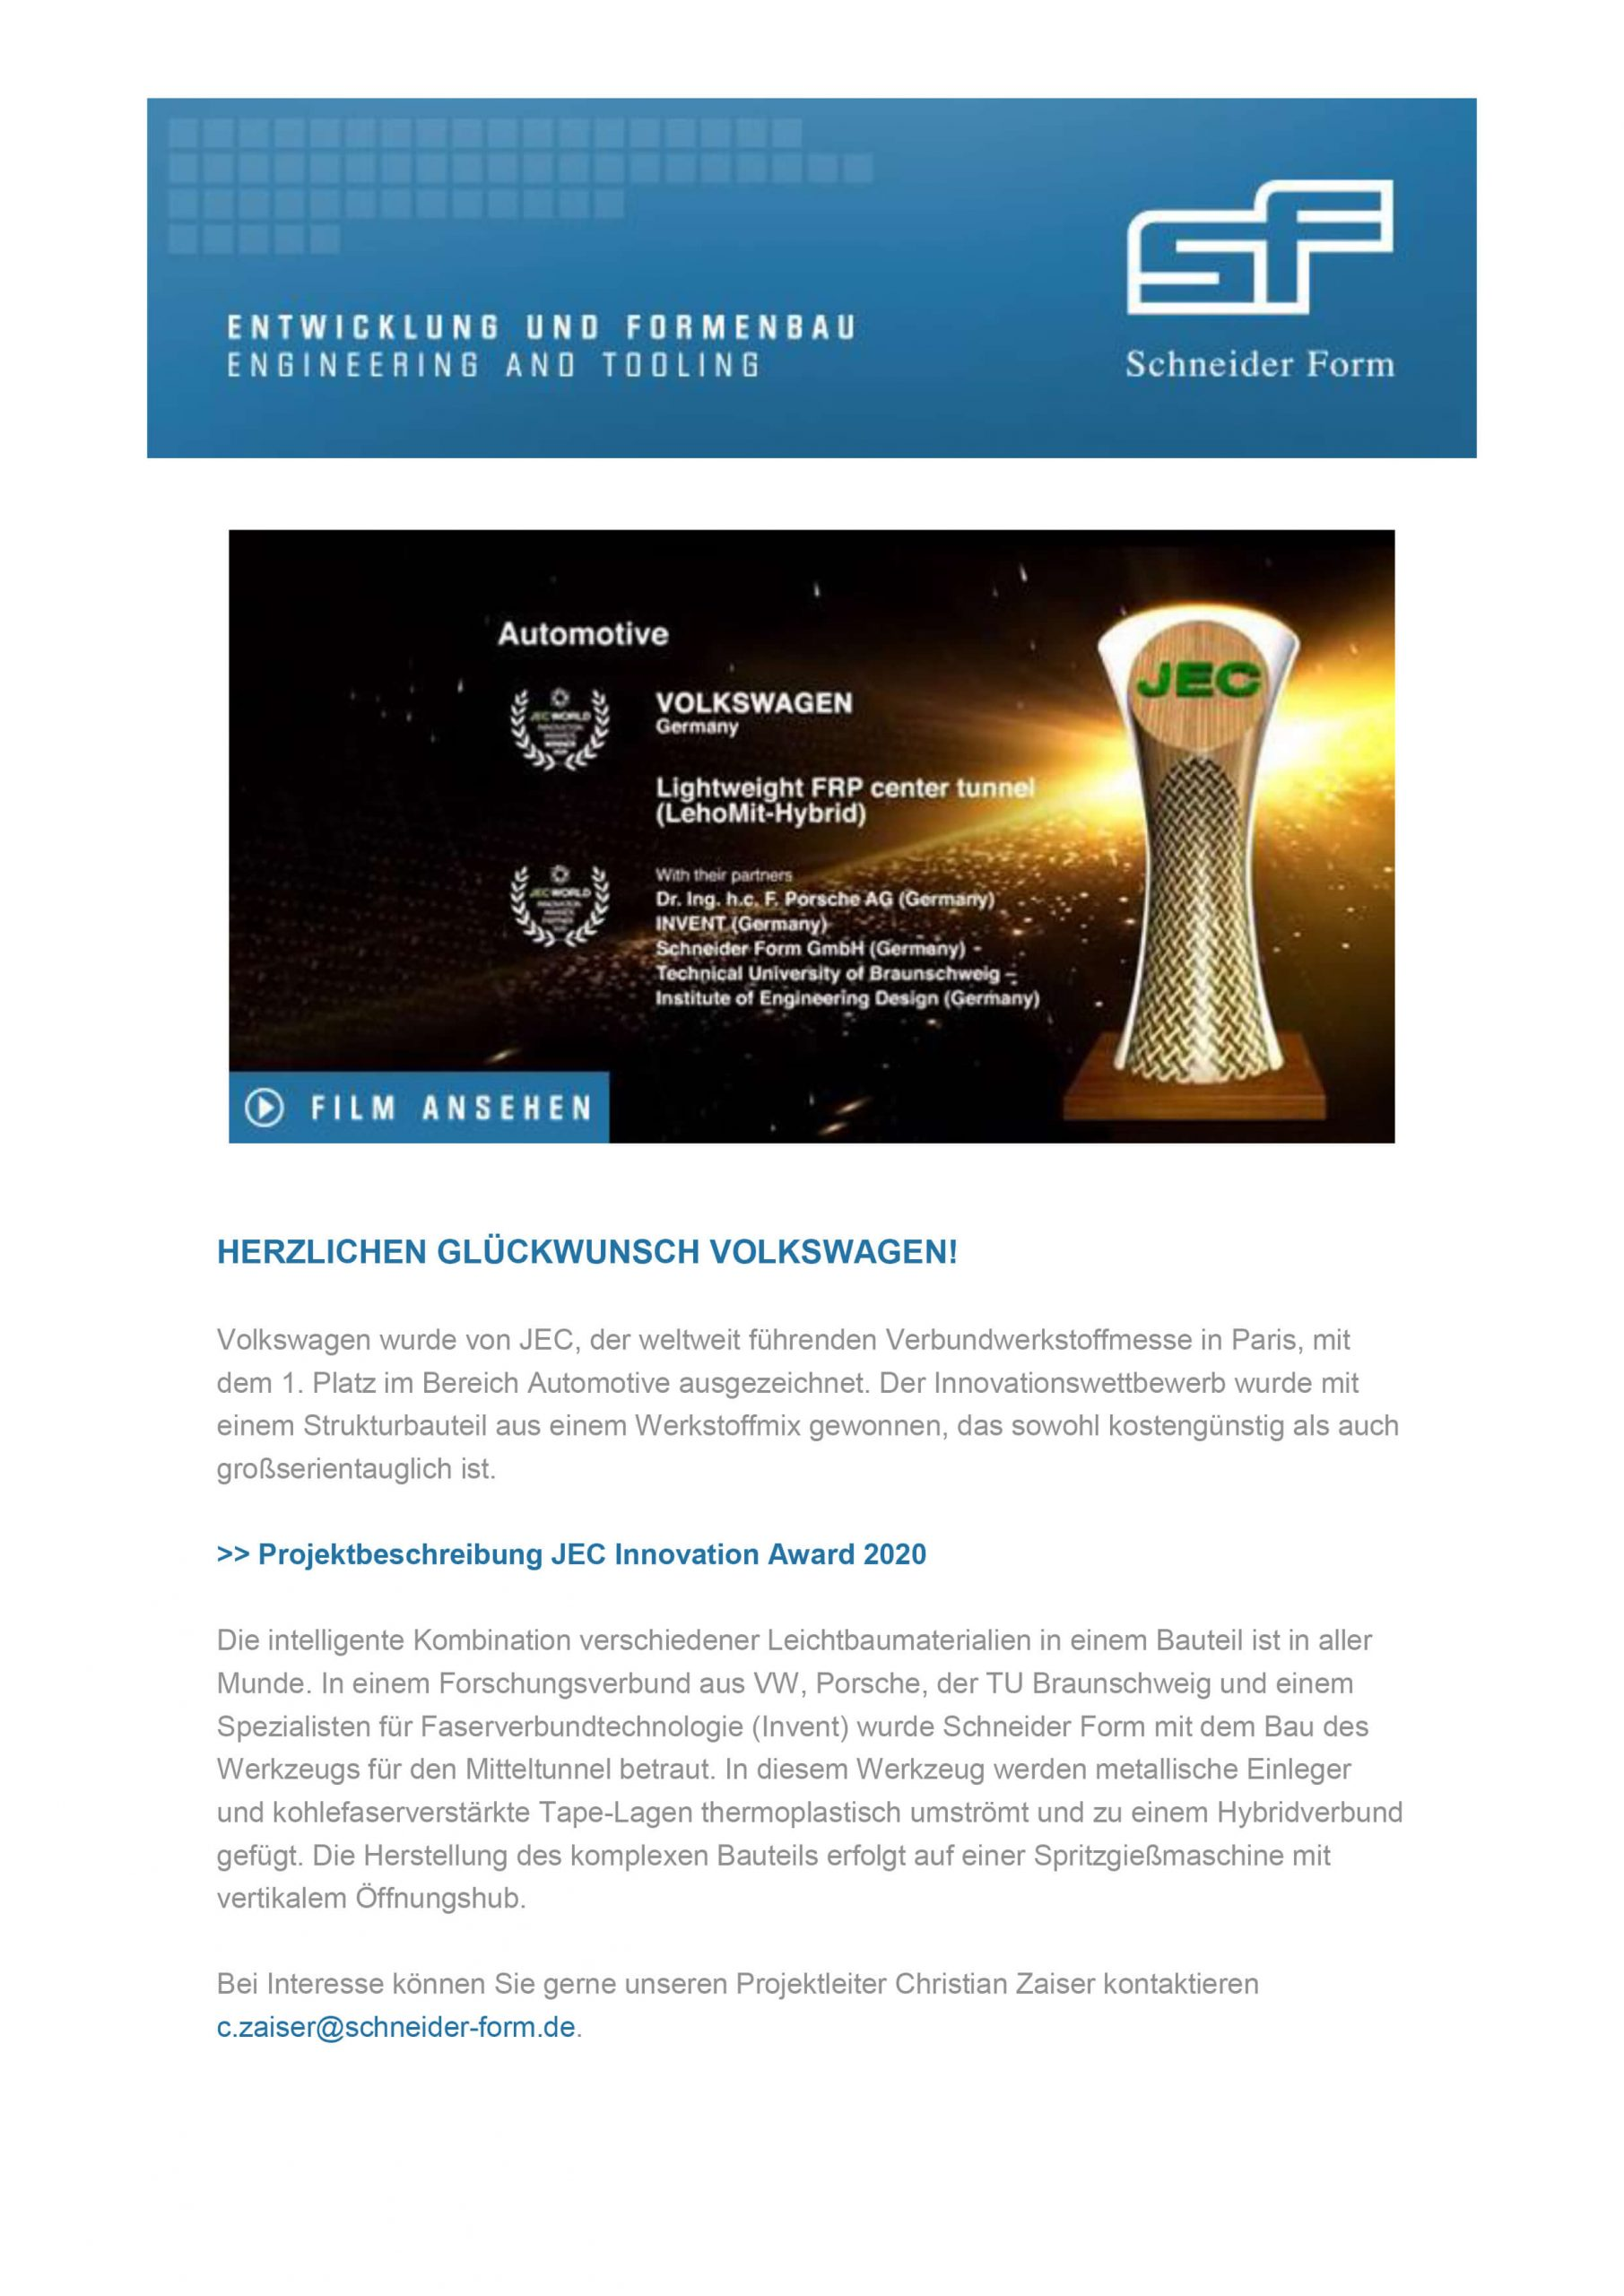 Schneider Form JEC Award 2020